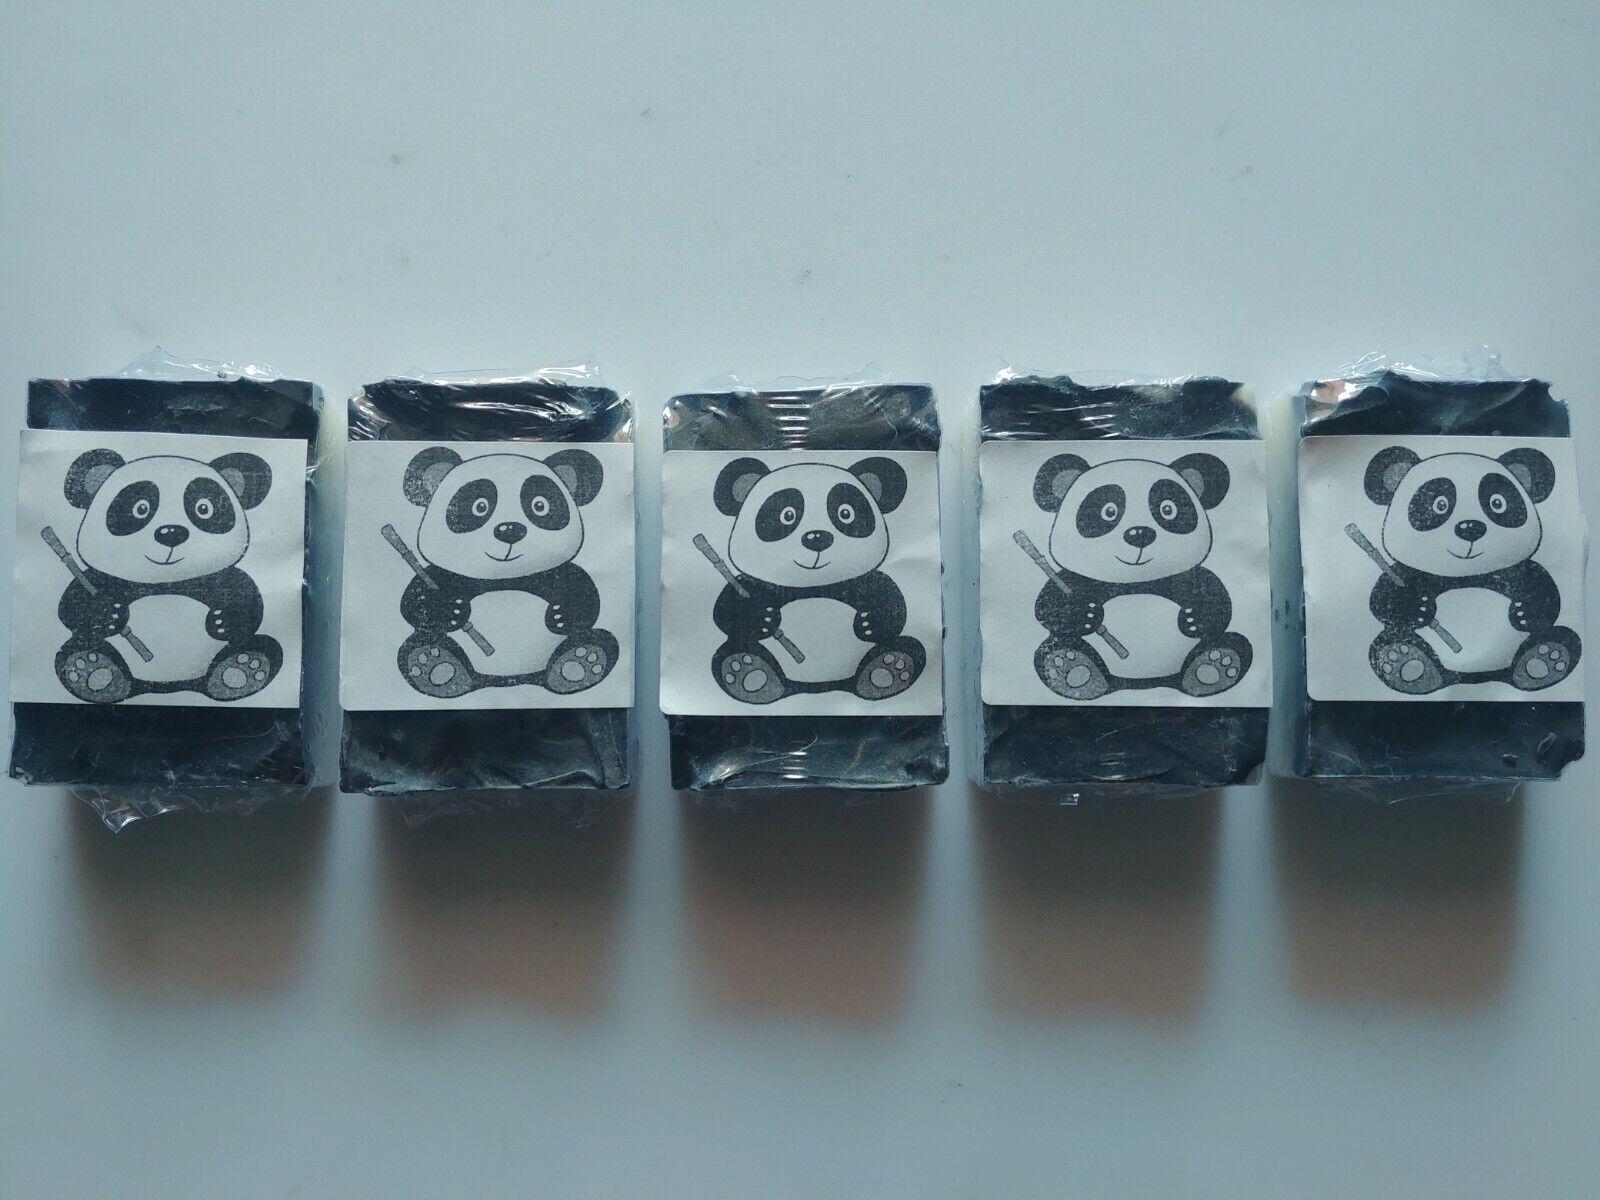 5 x Panda Bar Soap - Coconut Oil & Charcoal Unscented Homema